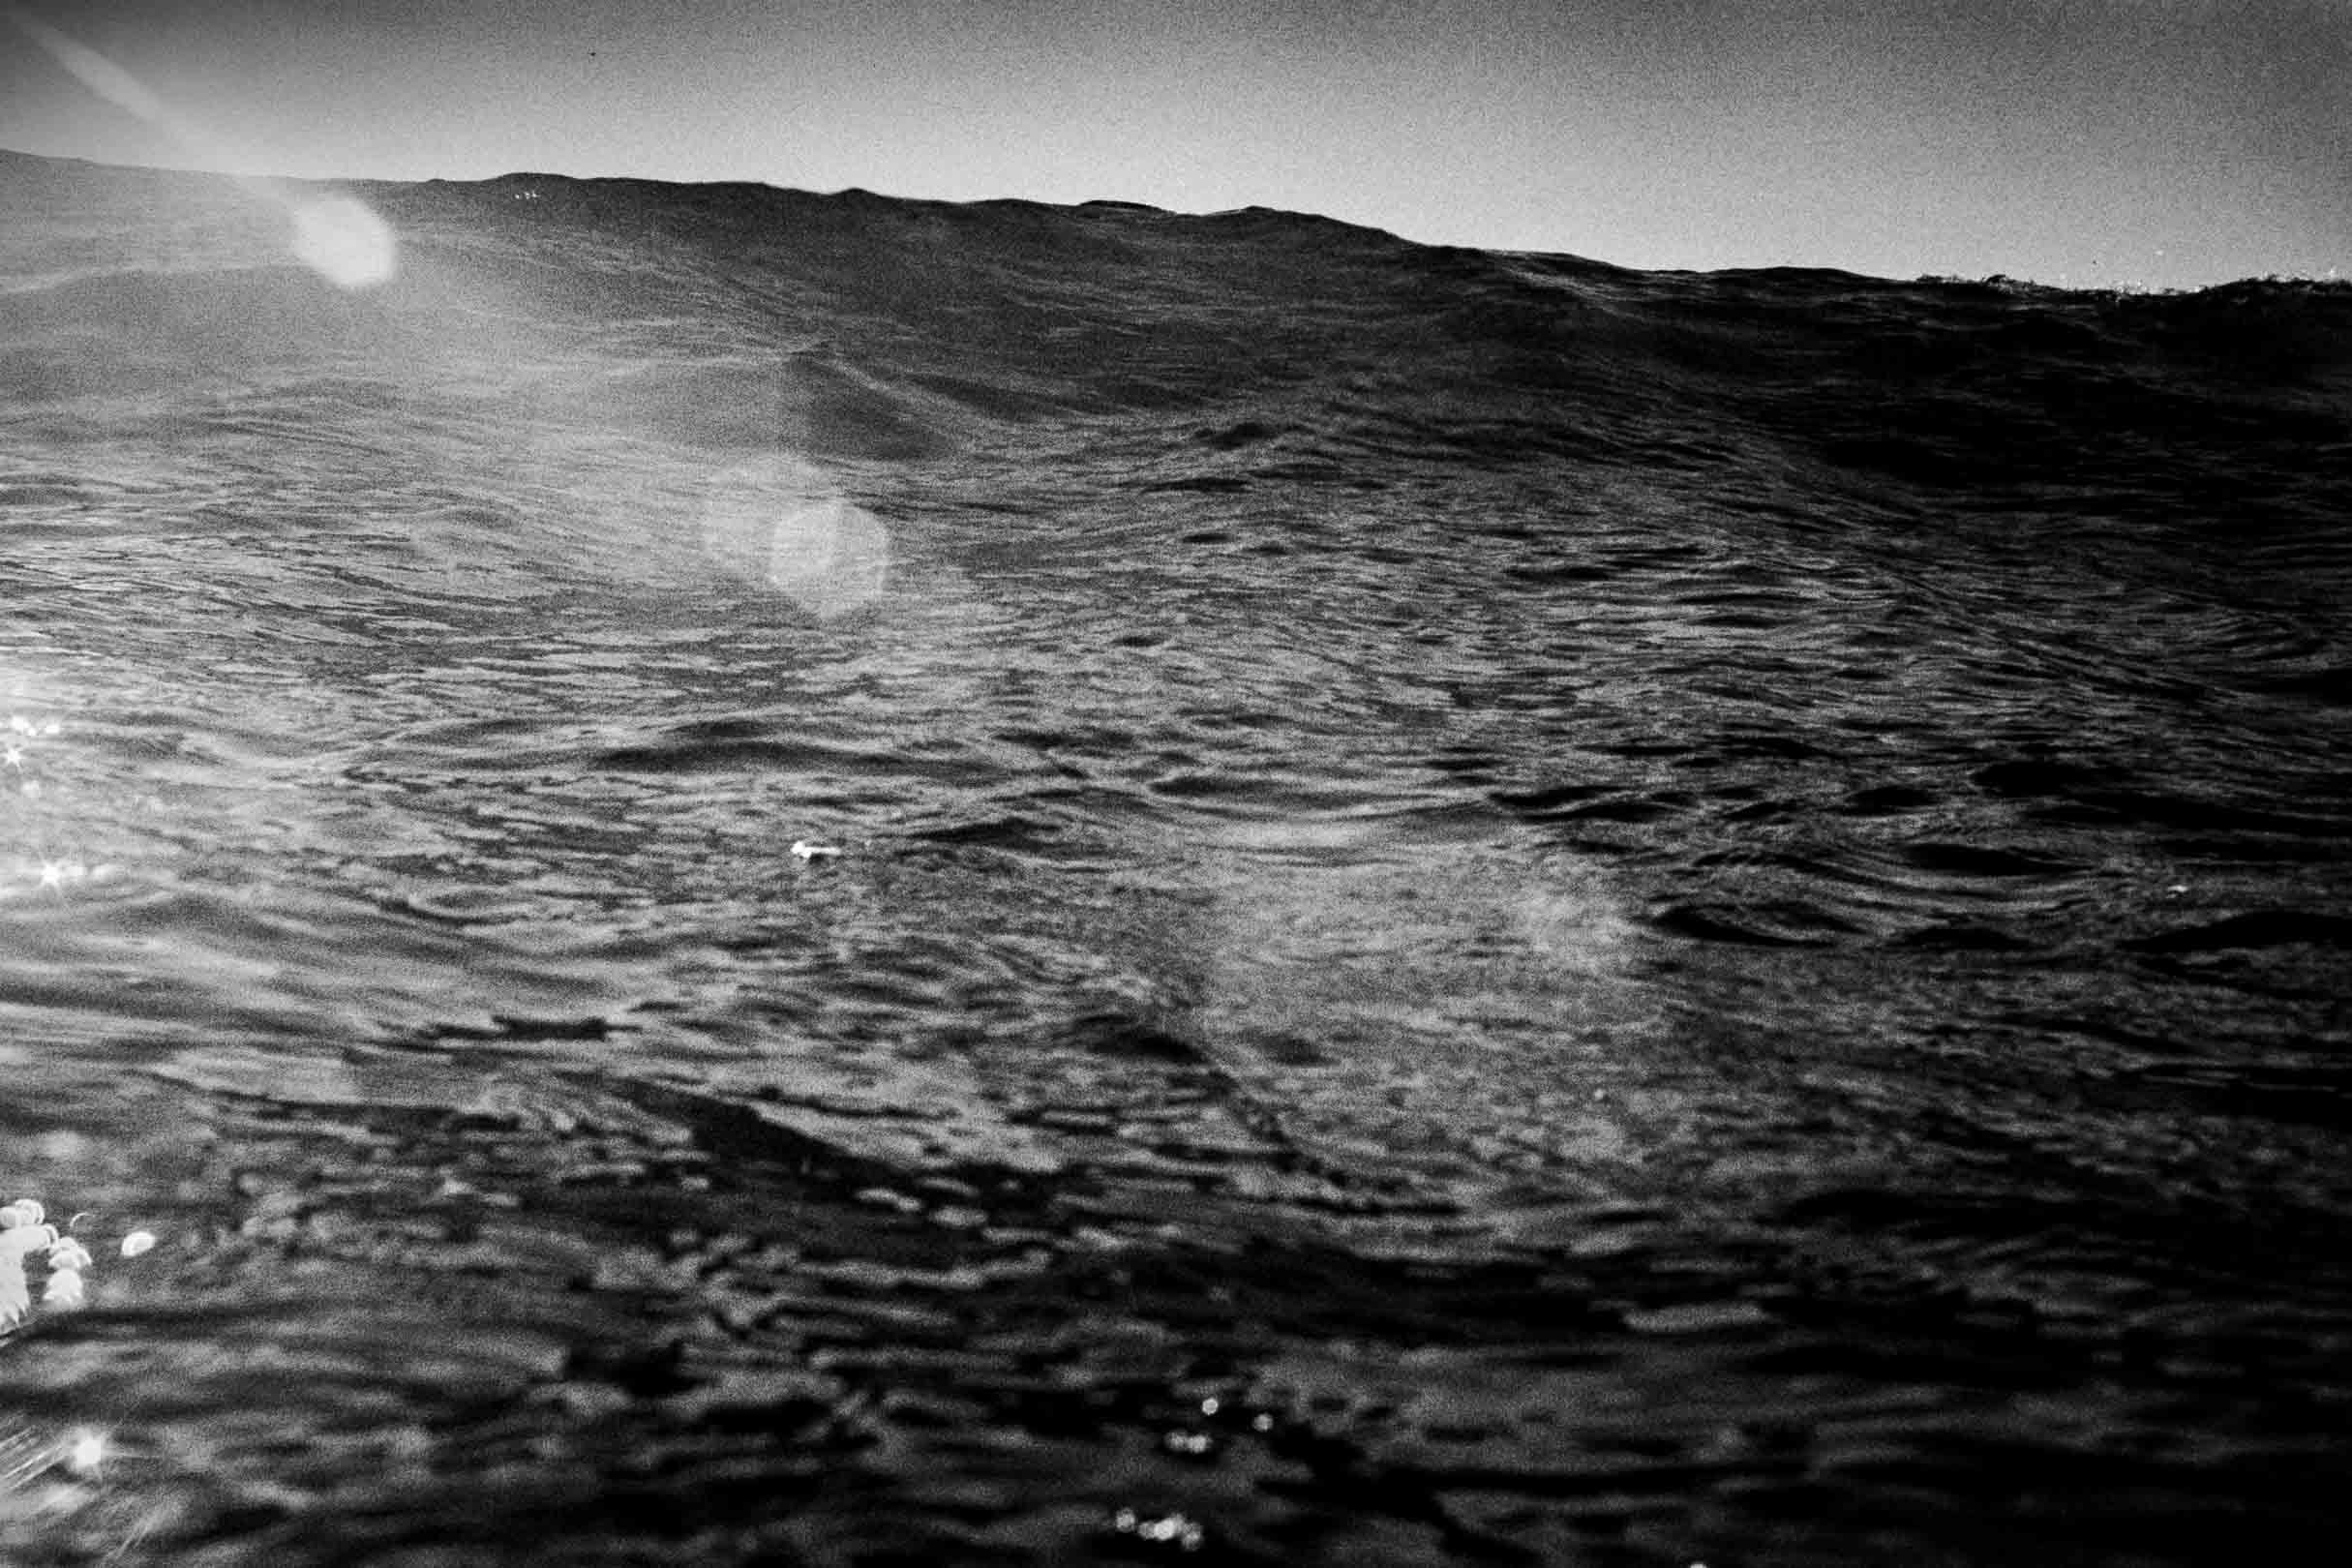 marino-fotografia-5.jpg